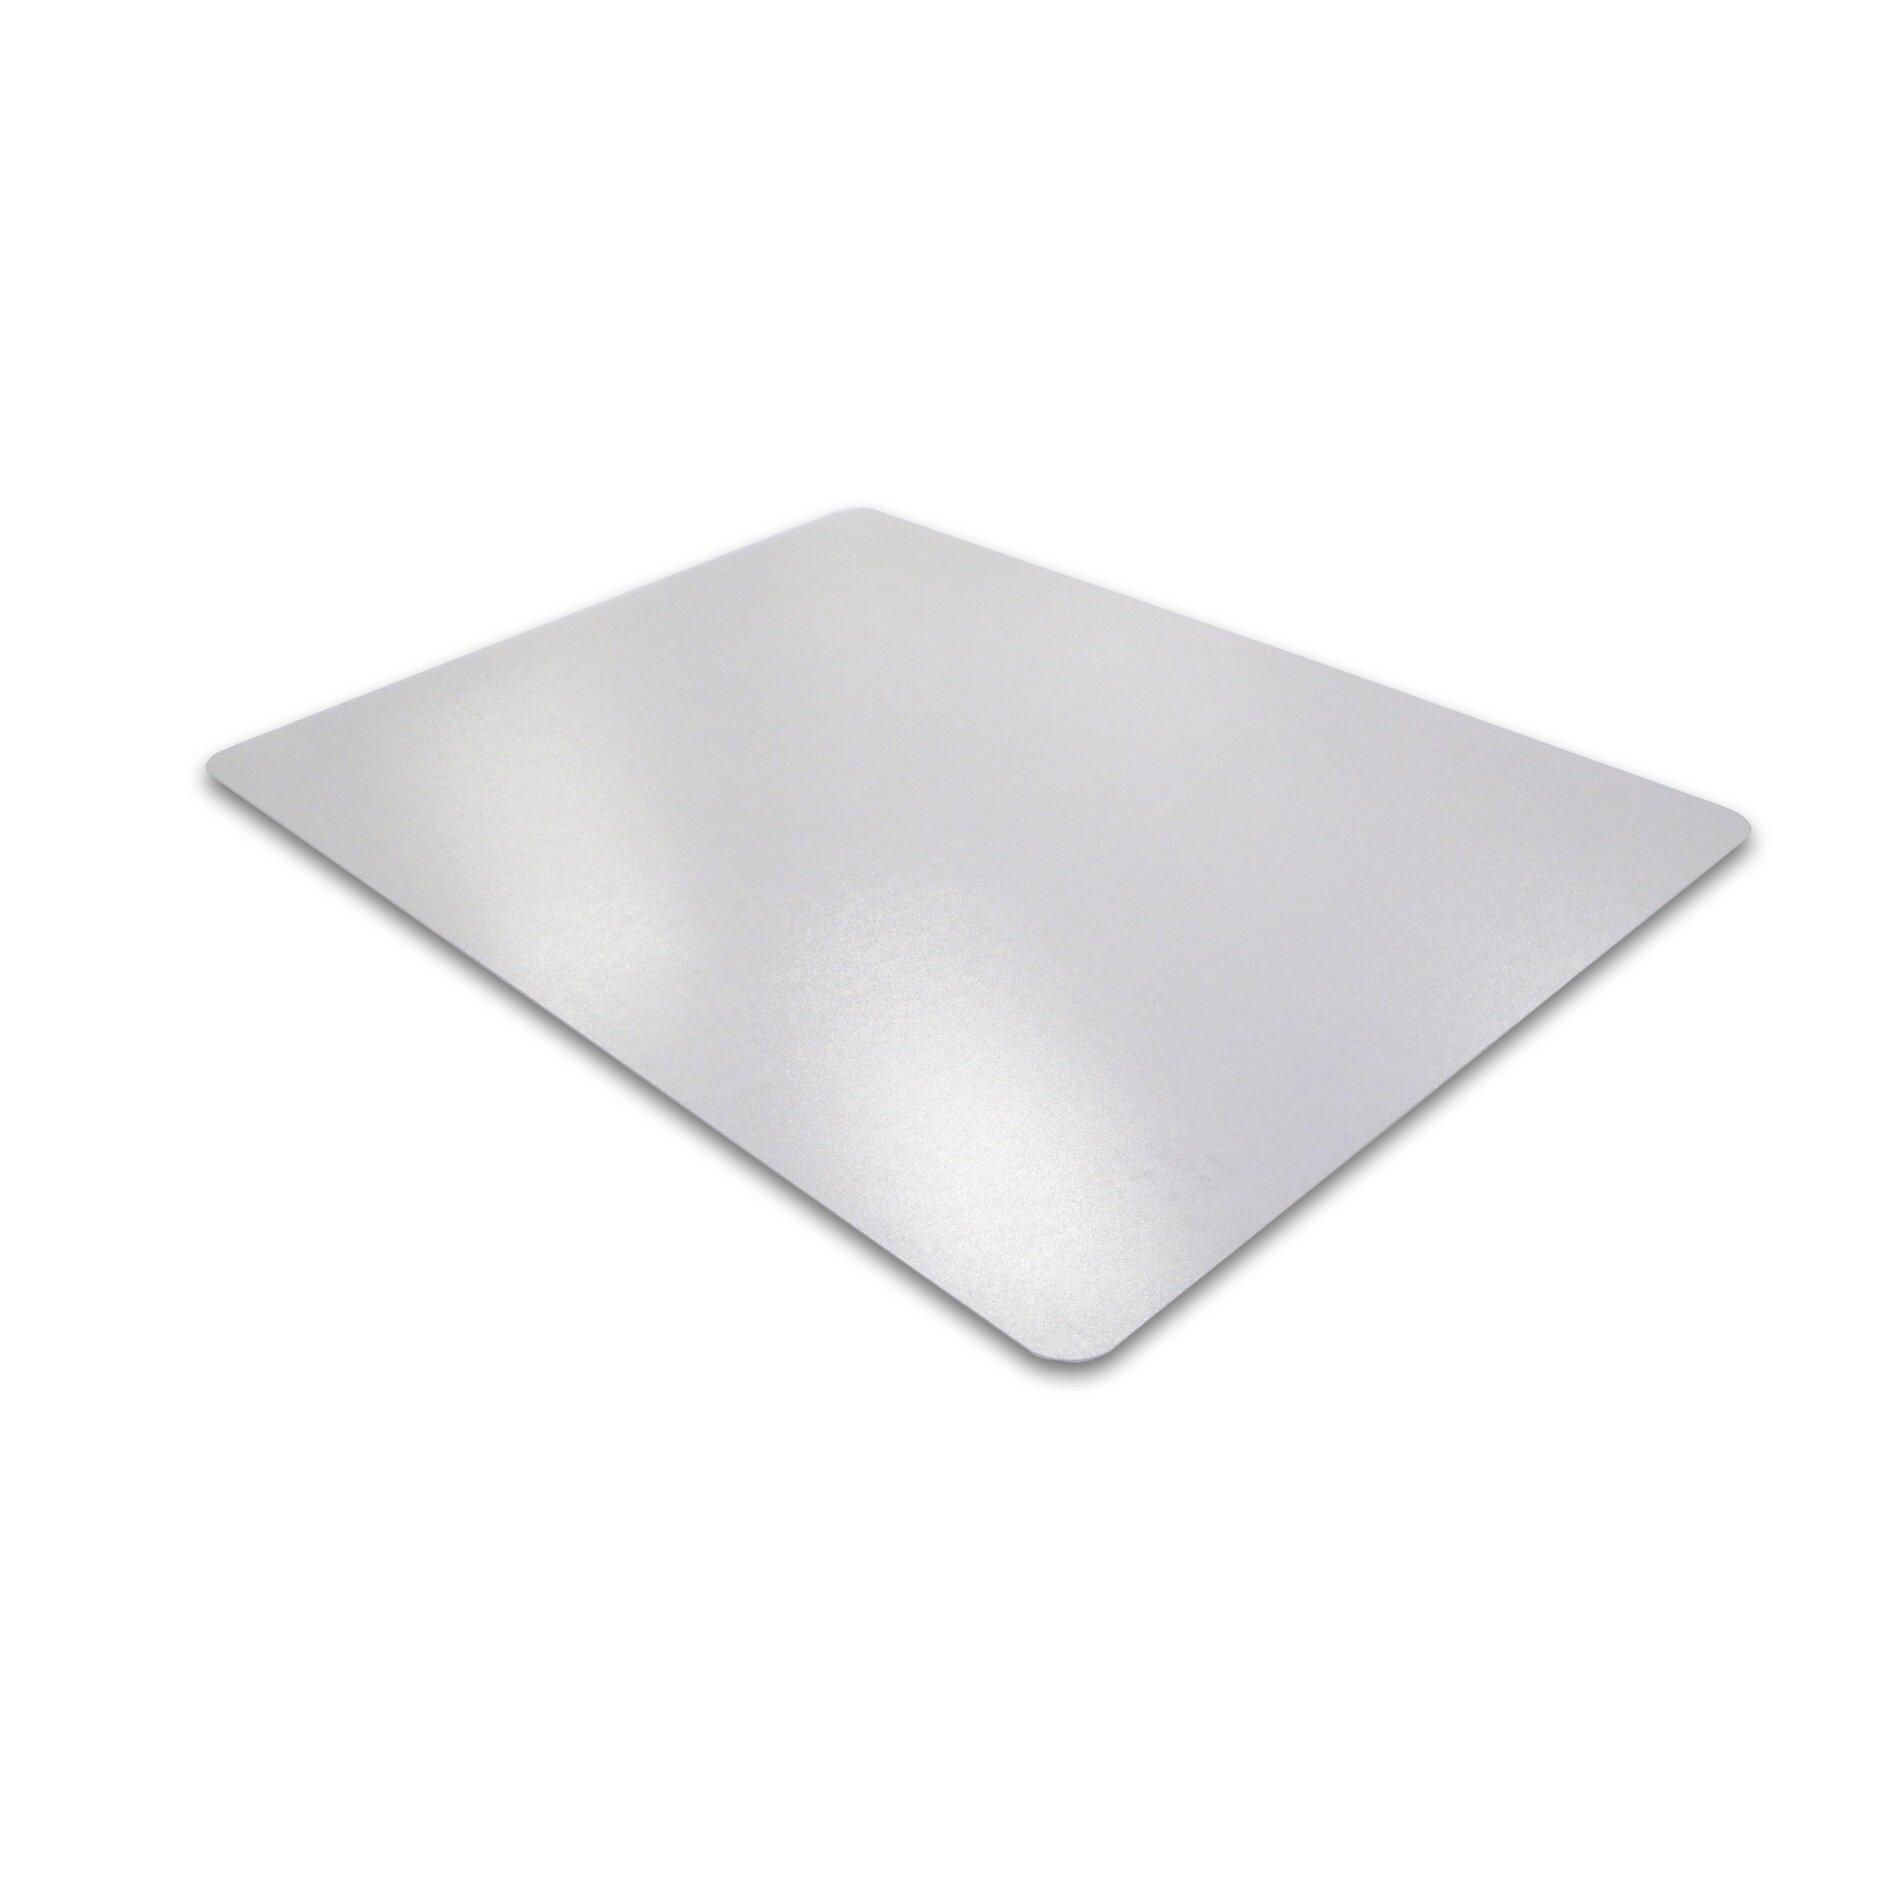 Polycarbonate Desk Protector